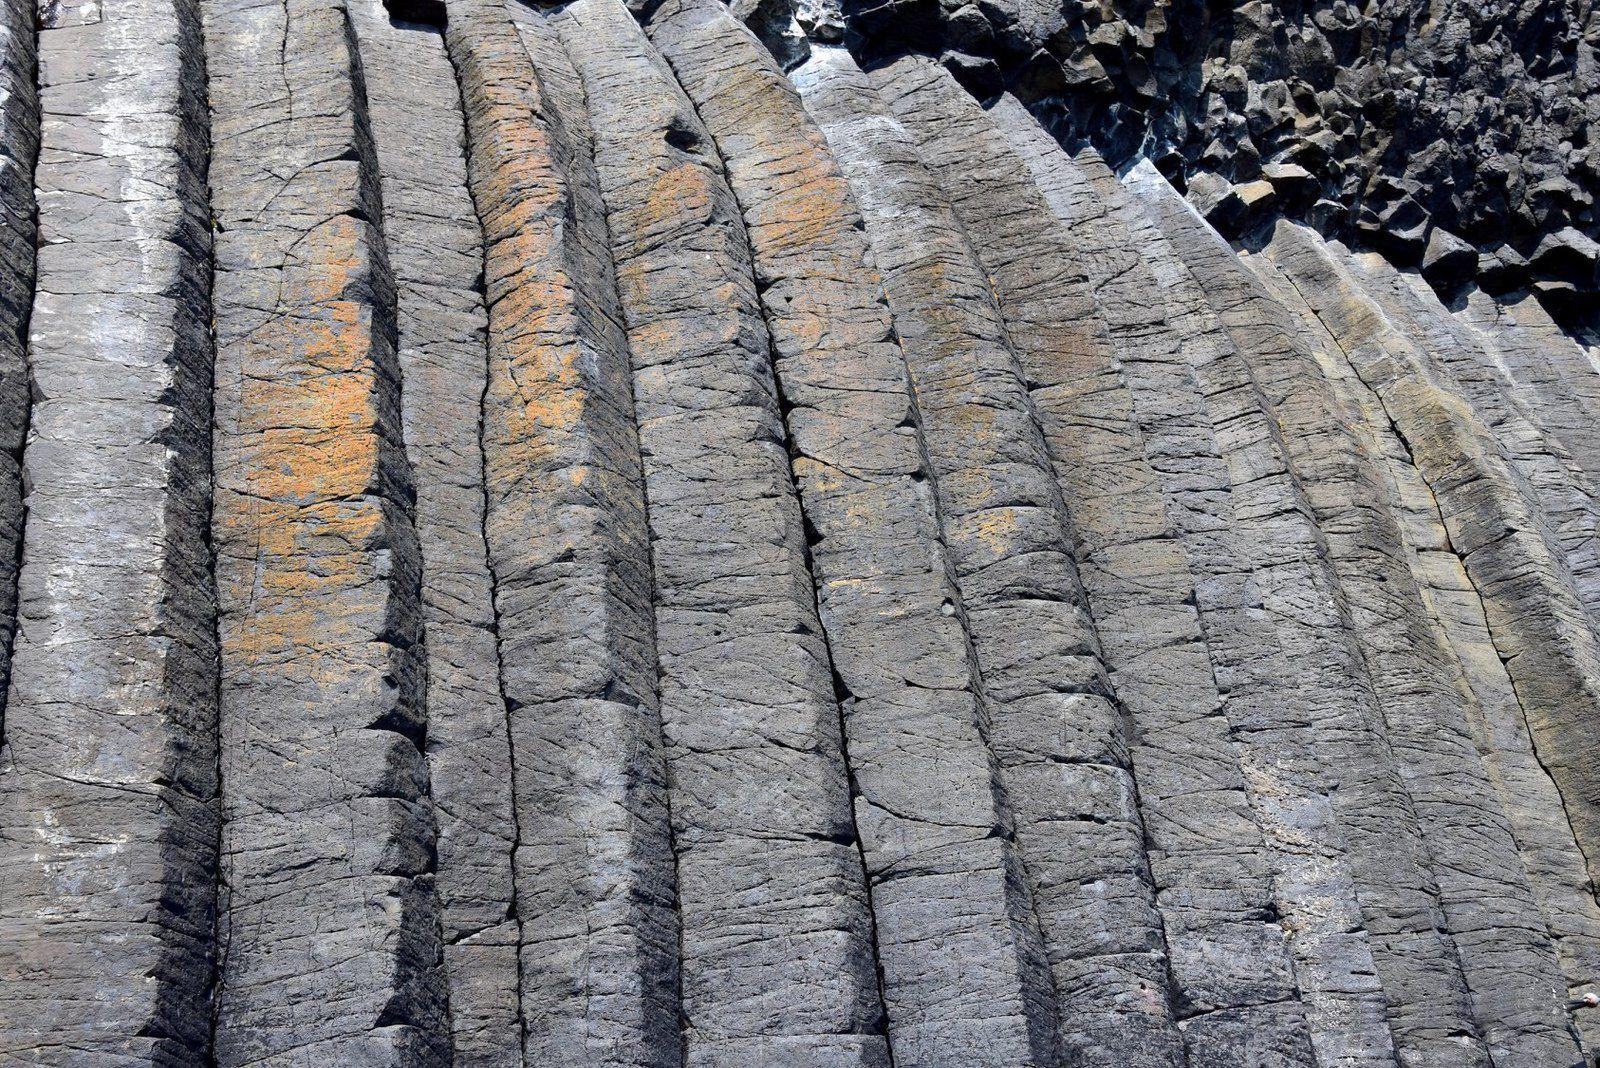 Les orgues basaltiques de l'île de Staffa